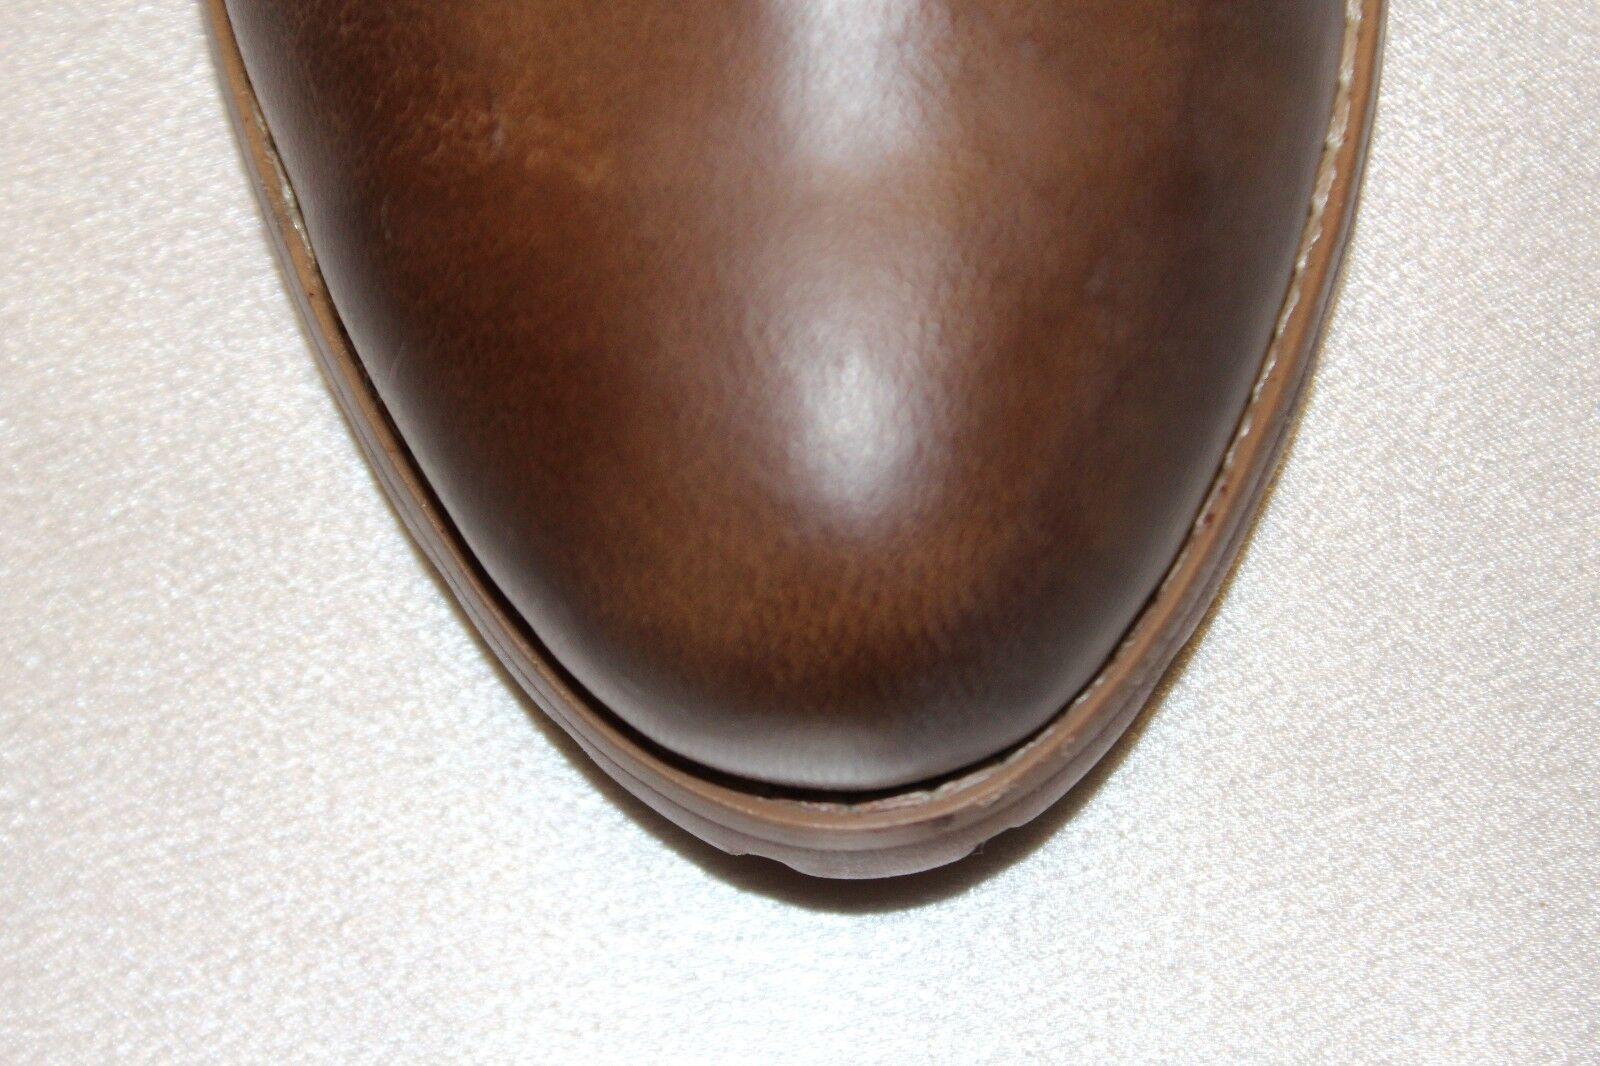 NEW  NIB  ANTELOPE Tabac Braun Leder & Mules Suede 756 Mules Clogs Mules & 180 0ba328